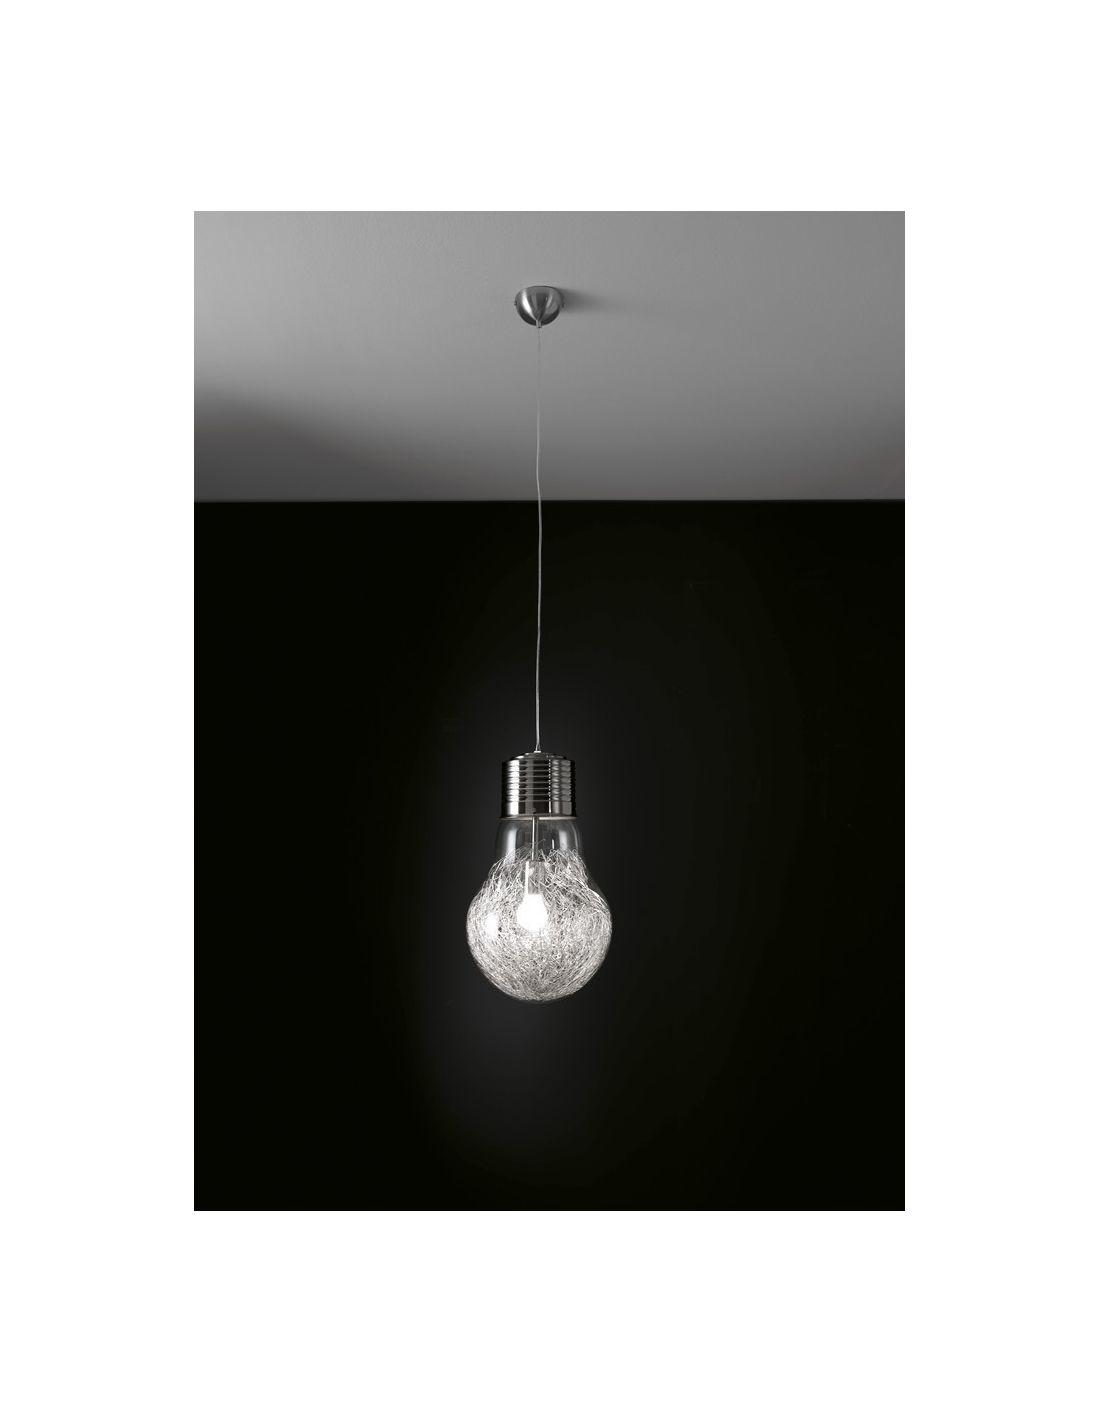 ... sospensione > Lampadario sospeso Gwenda design a forma di lampadina